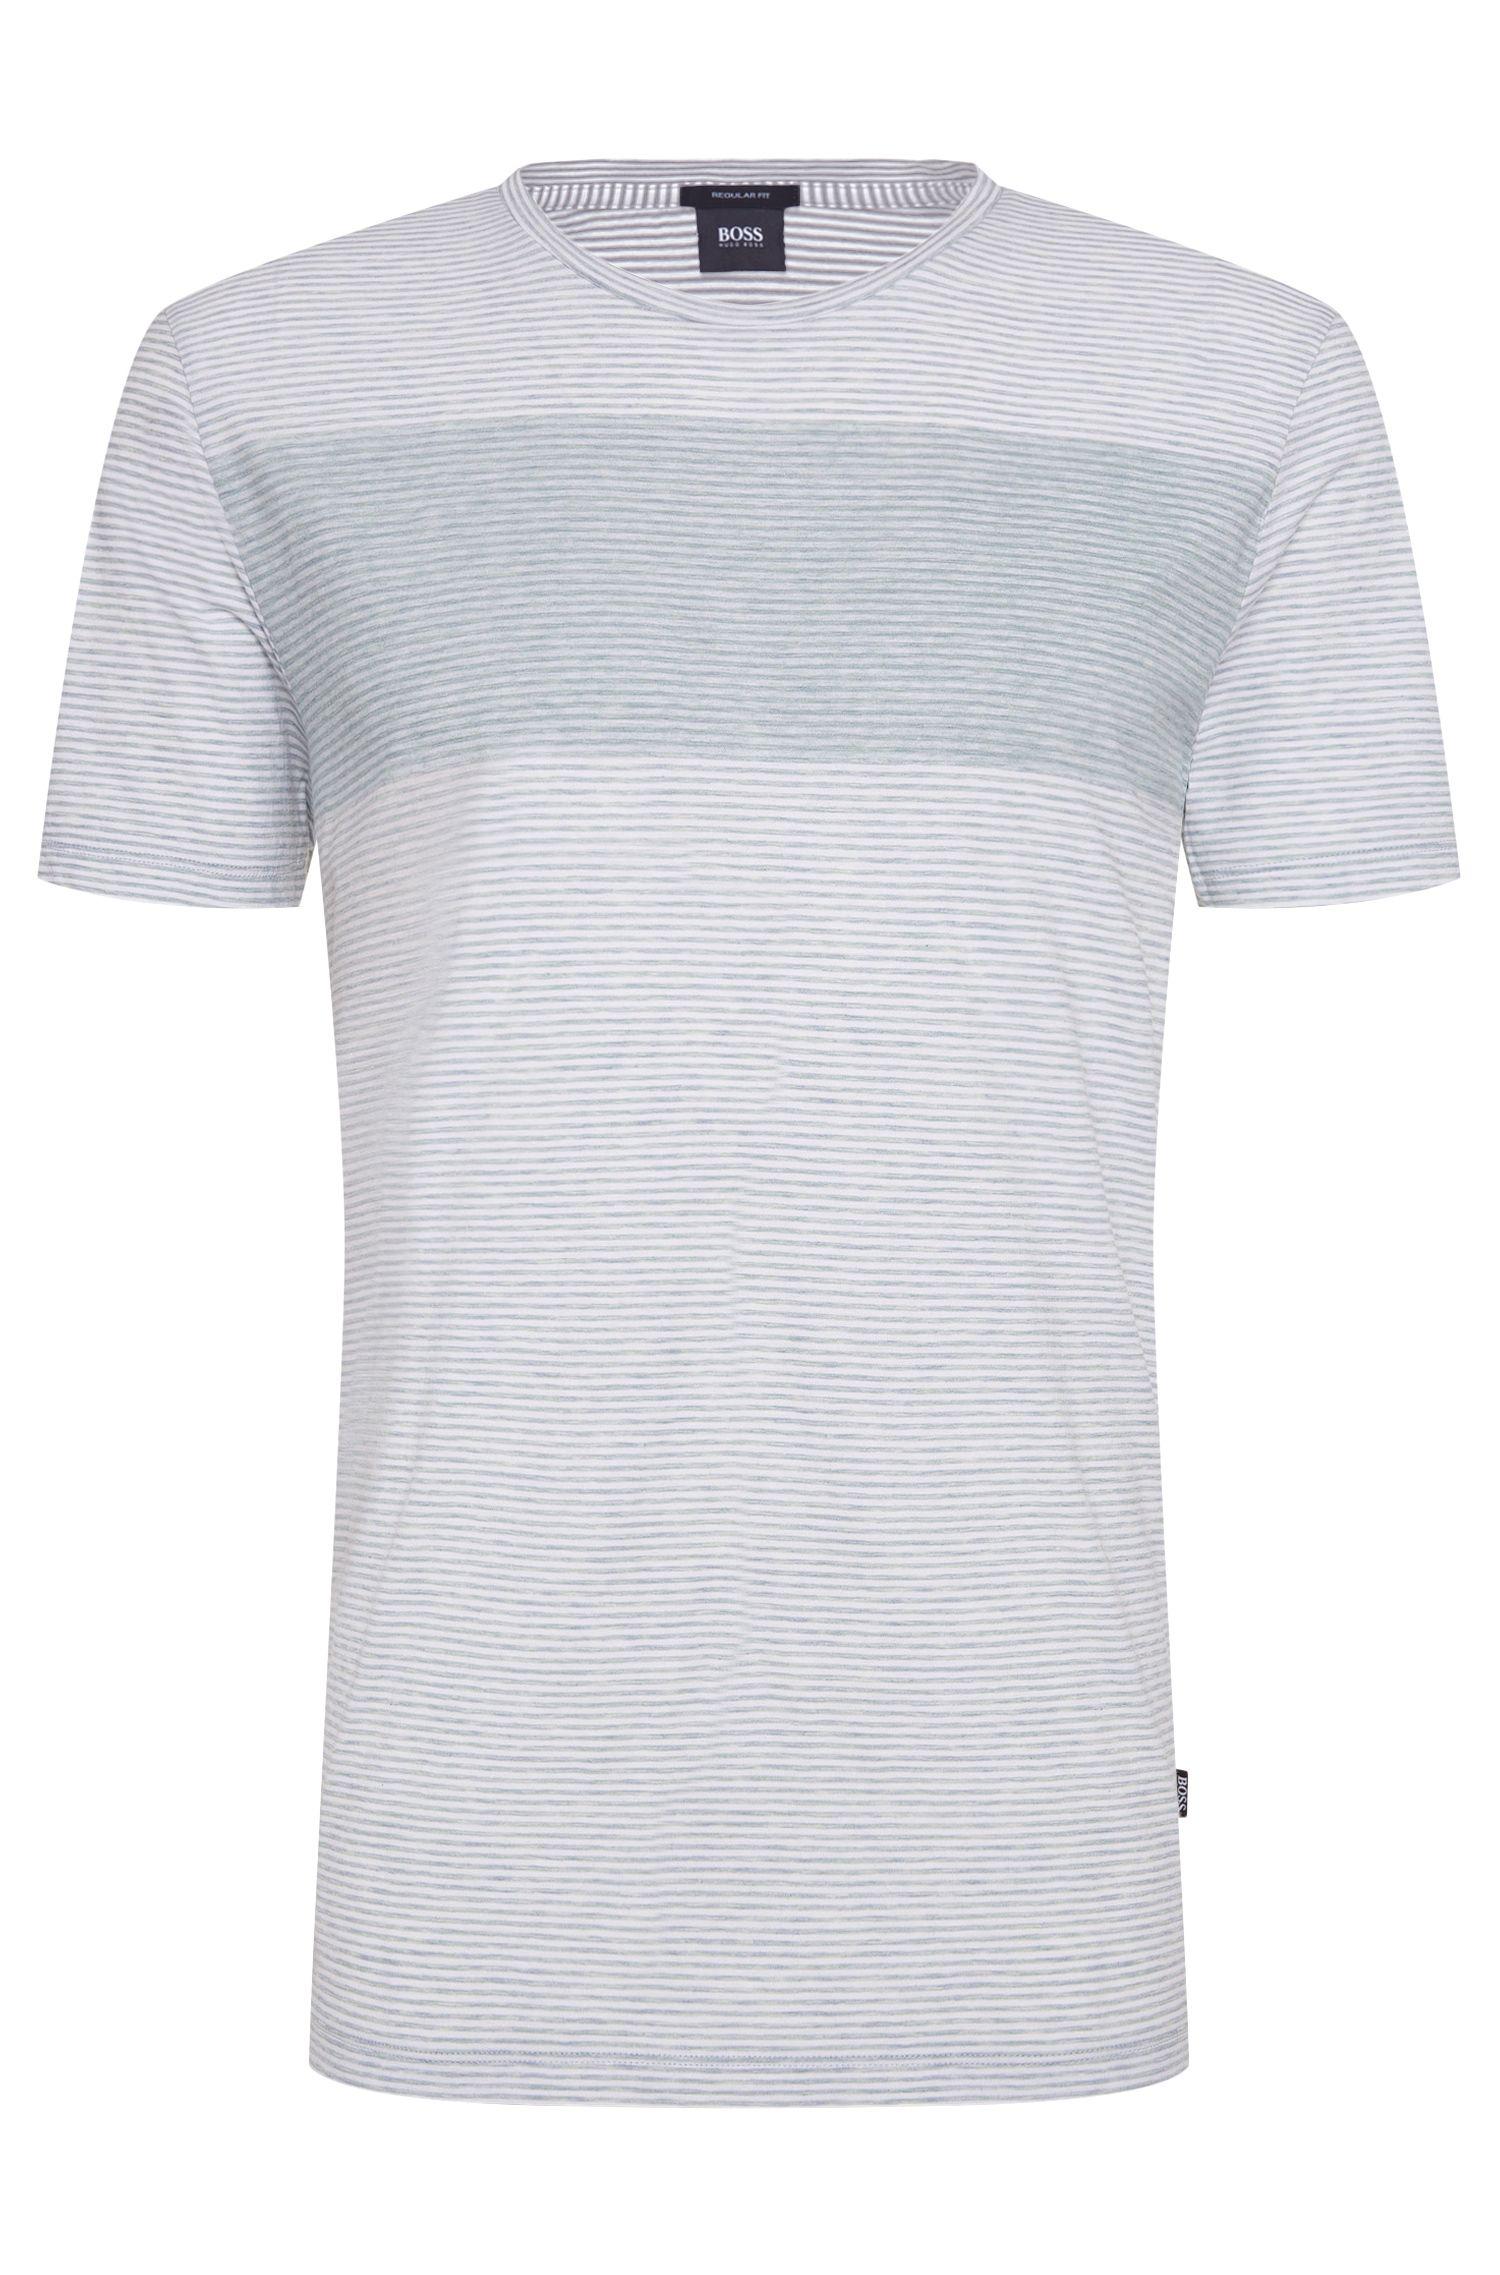 'Tiburt' | Cotton Striped T-Shirt